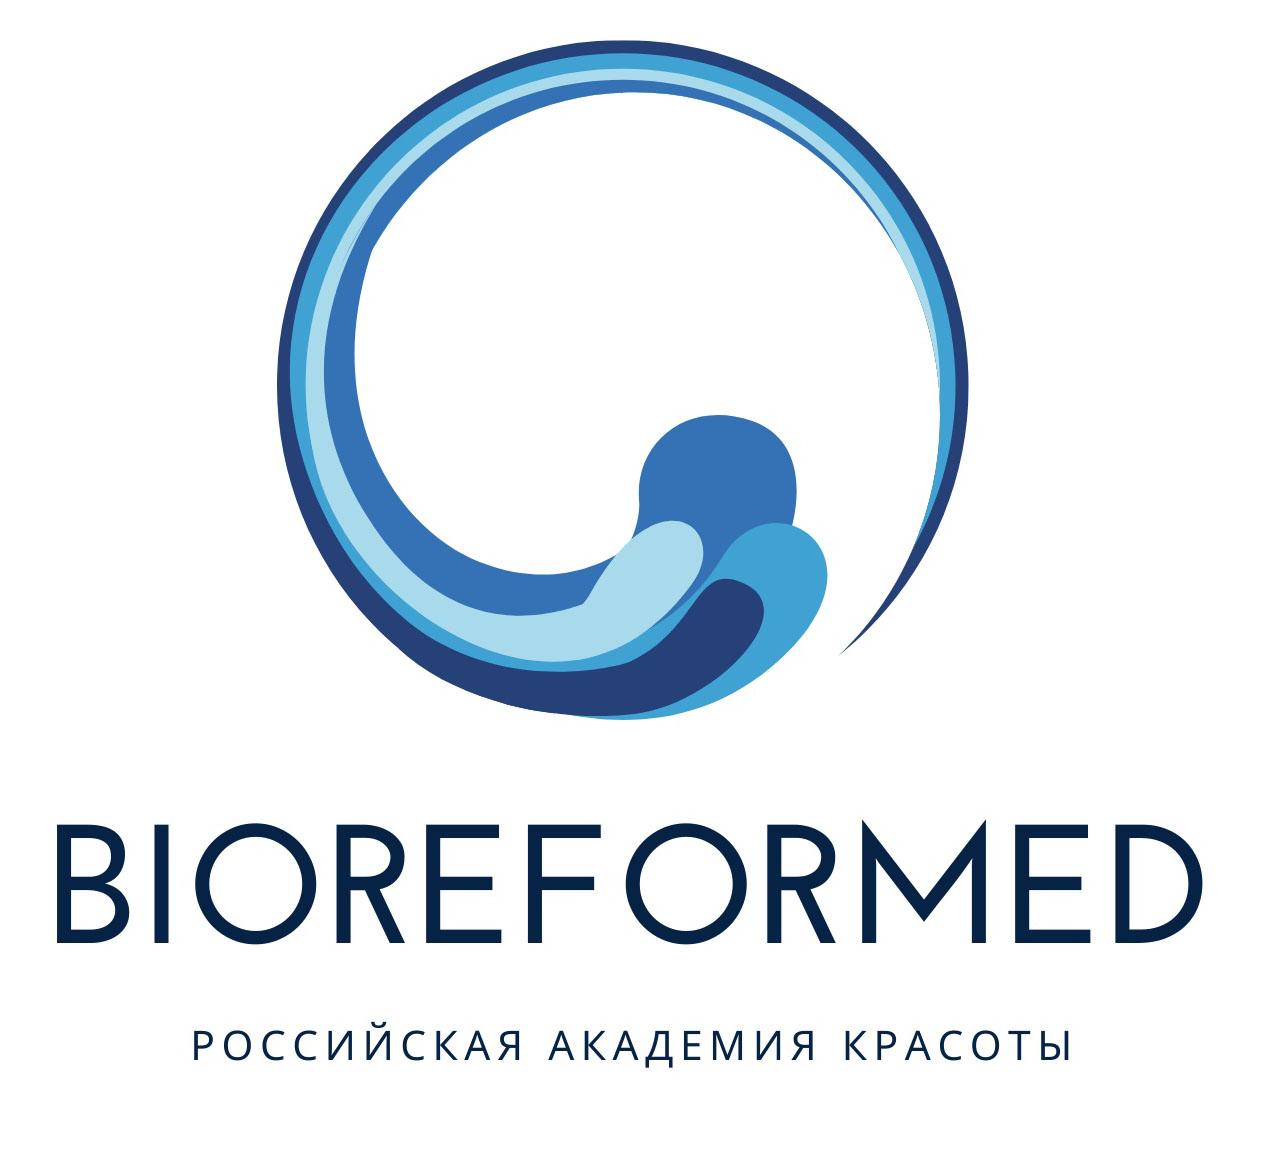 Интернет магазин Bioreformed